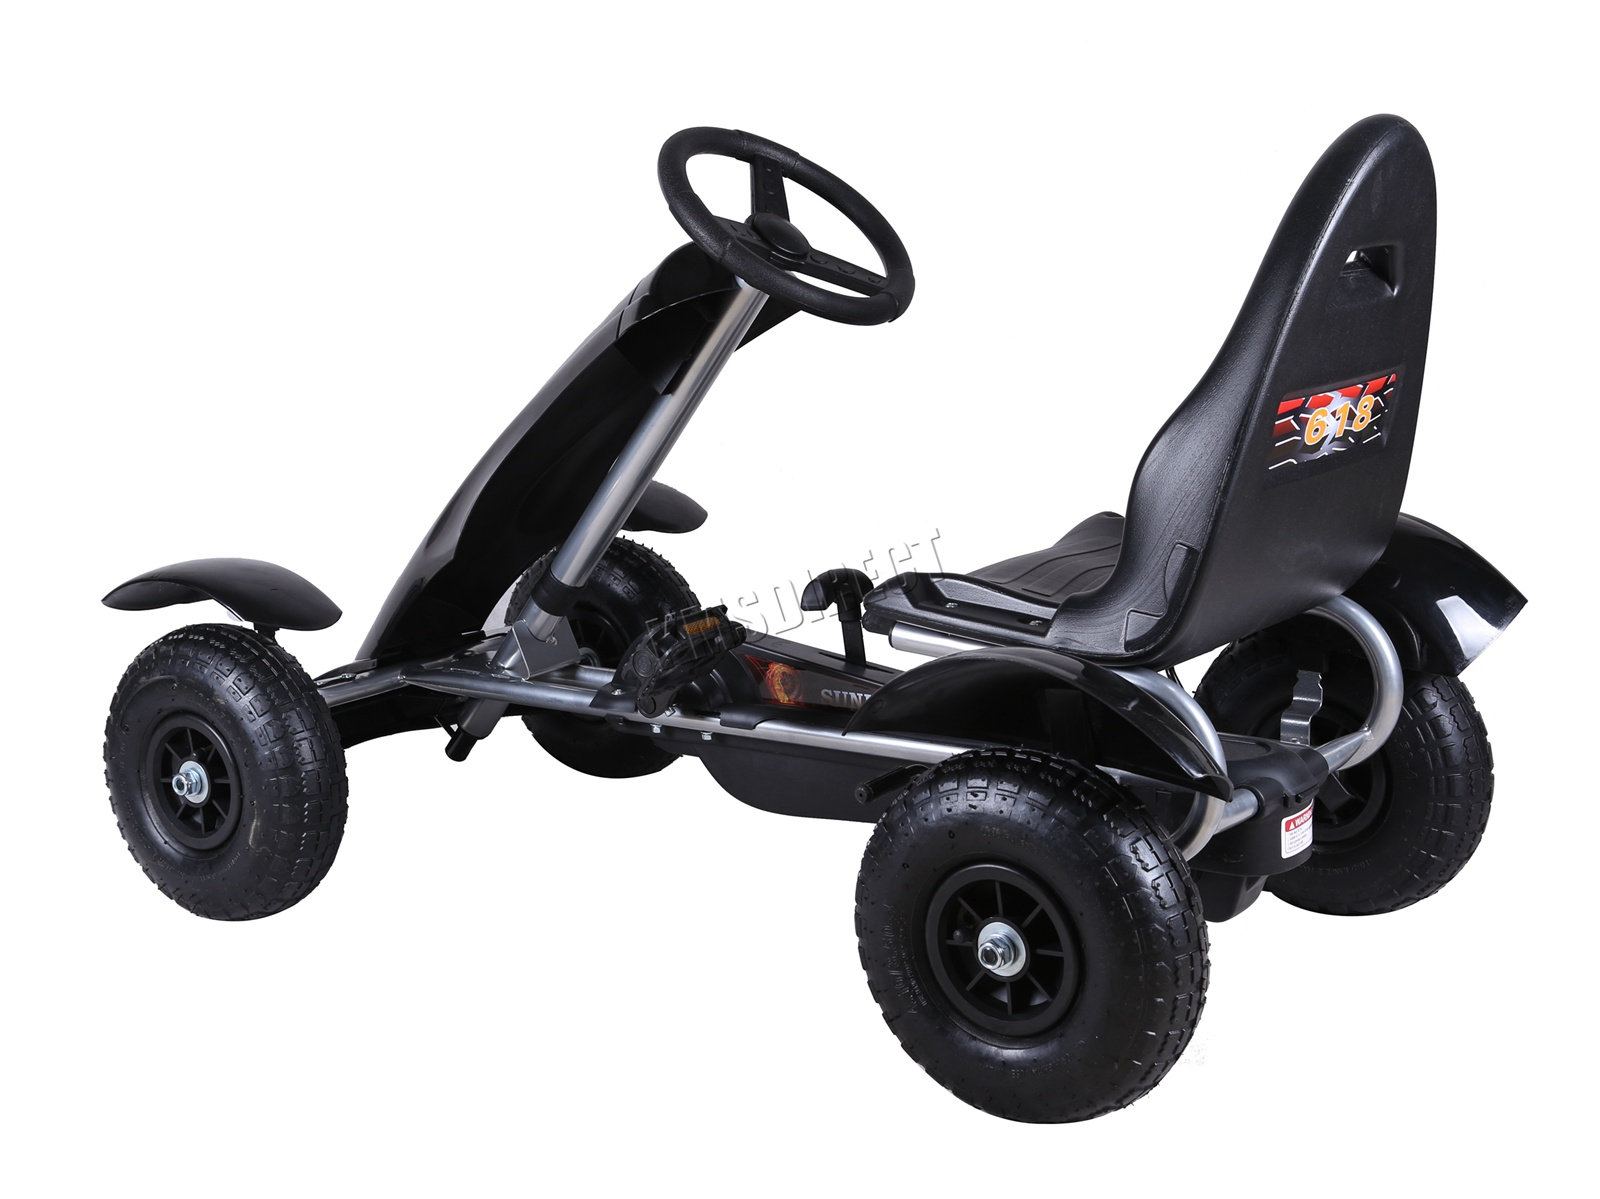 201701719267 2475 I 305 25 GOKART FH G03 BLACK KMSWM088 - Foxhunter Infantil Go Kart – Pedal Coche para Niños Gocart con Freno de Mano G03